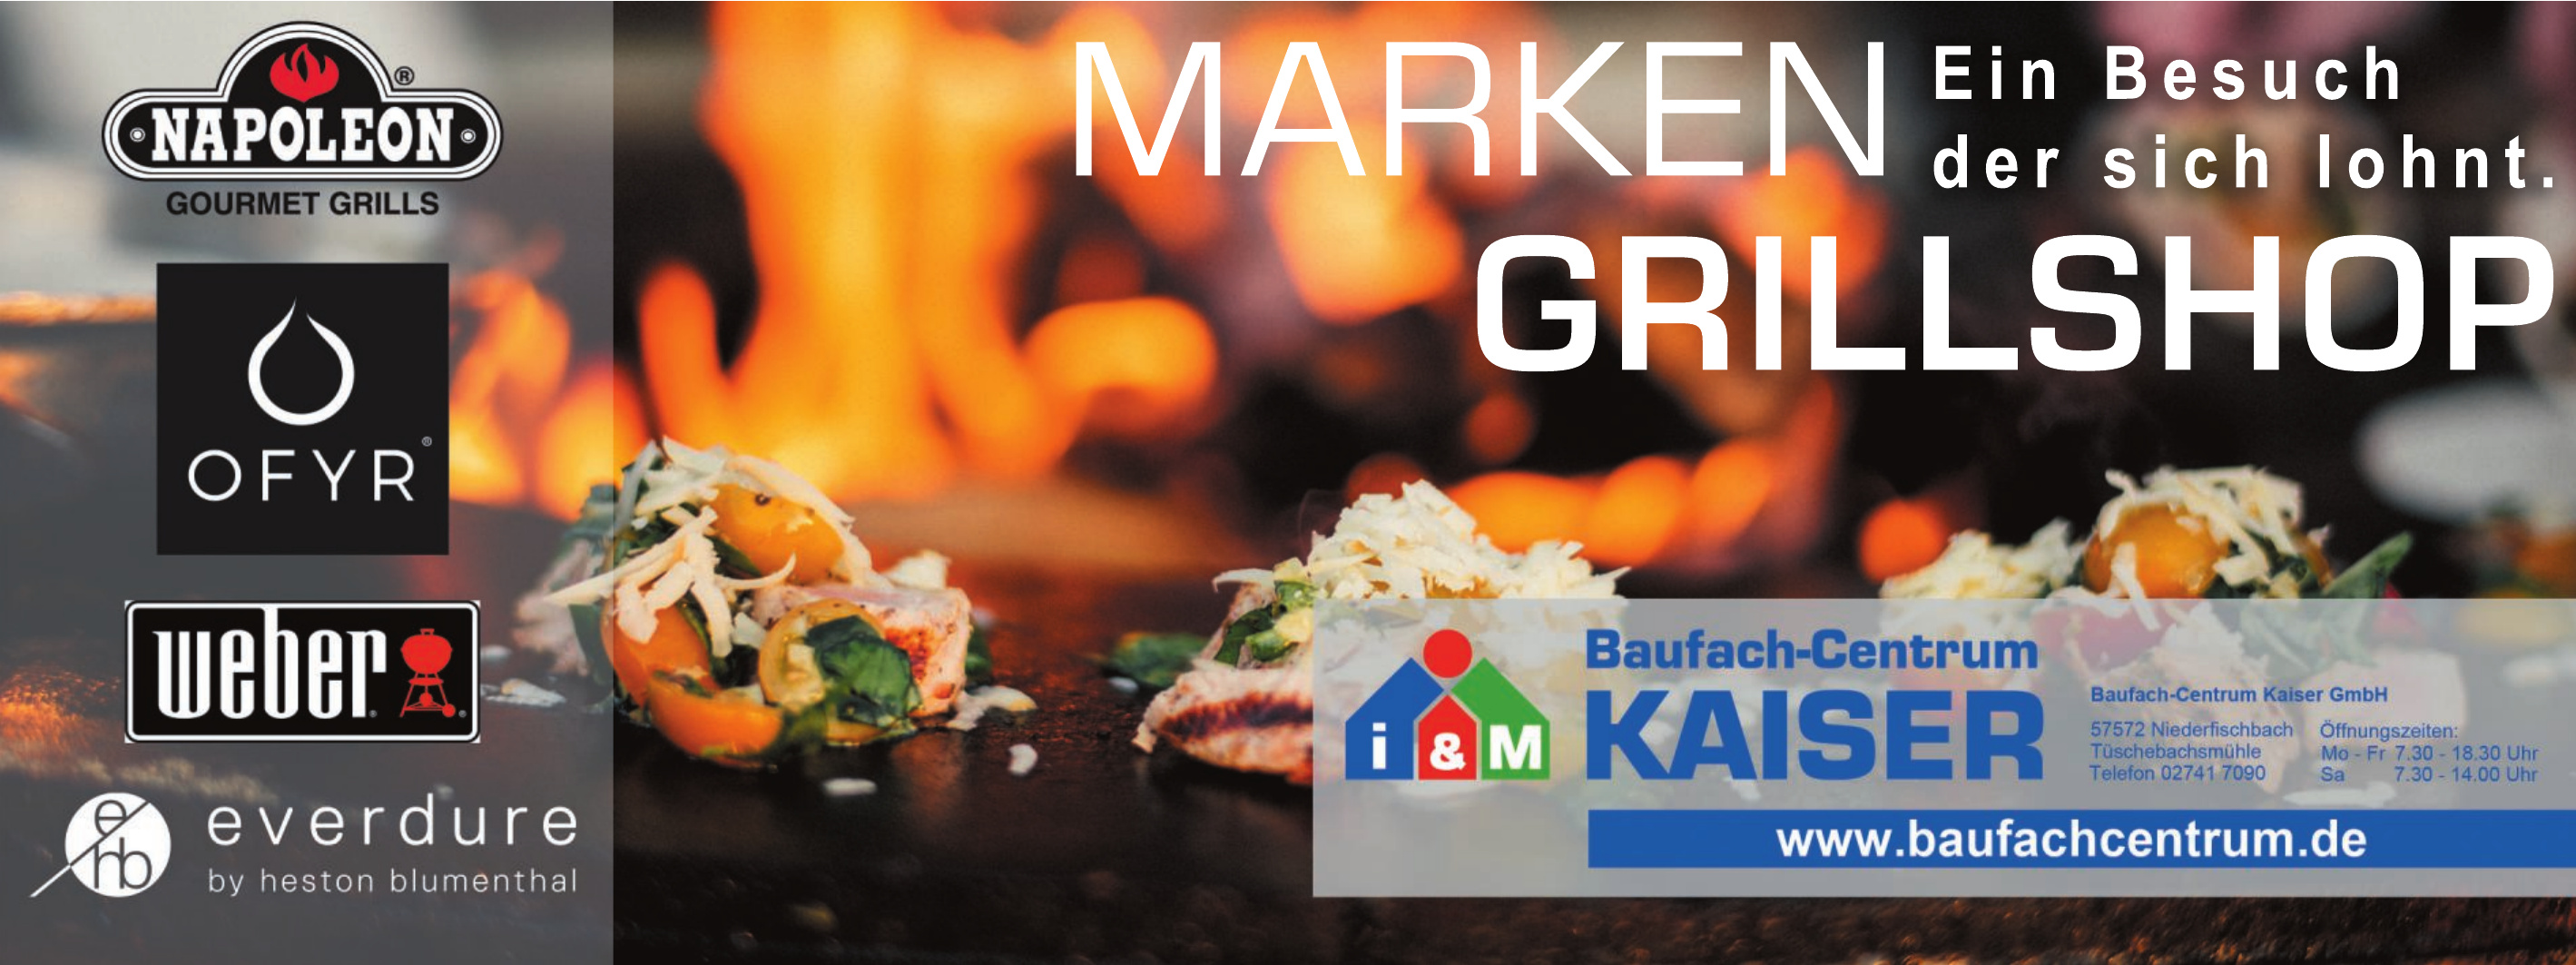 Baufach-Centrum Kaiser GmbH